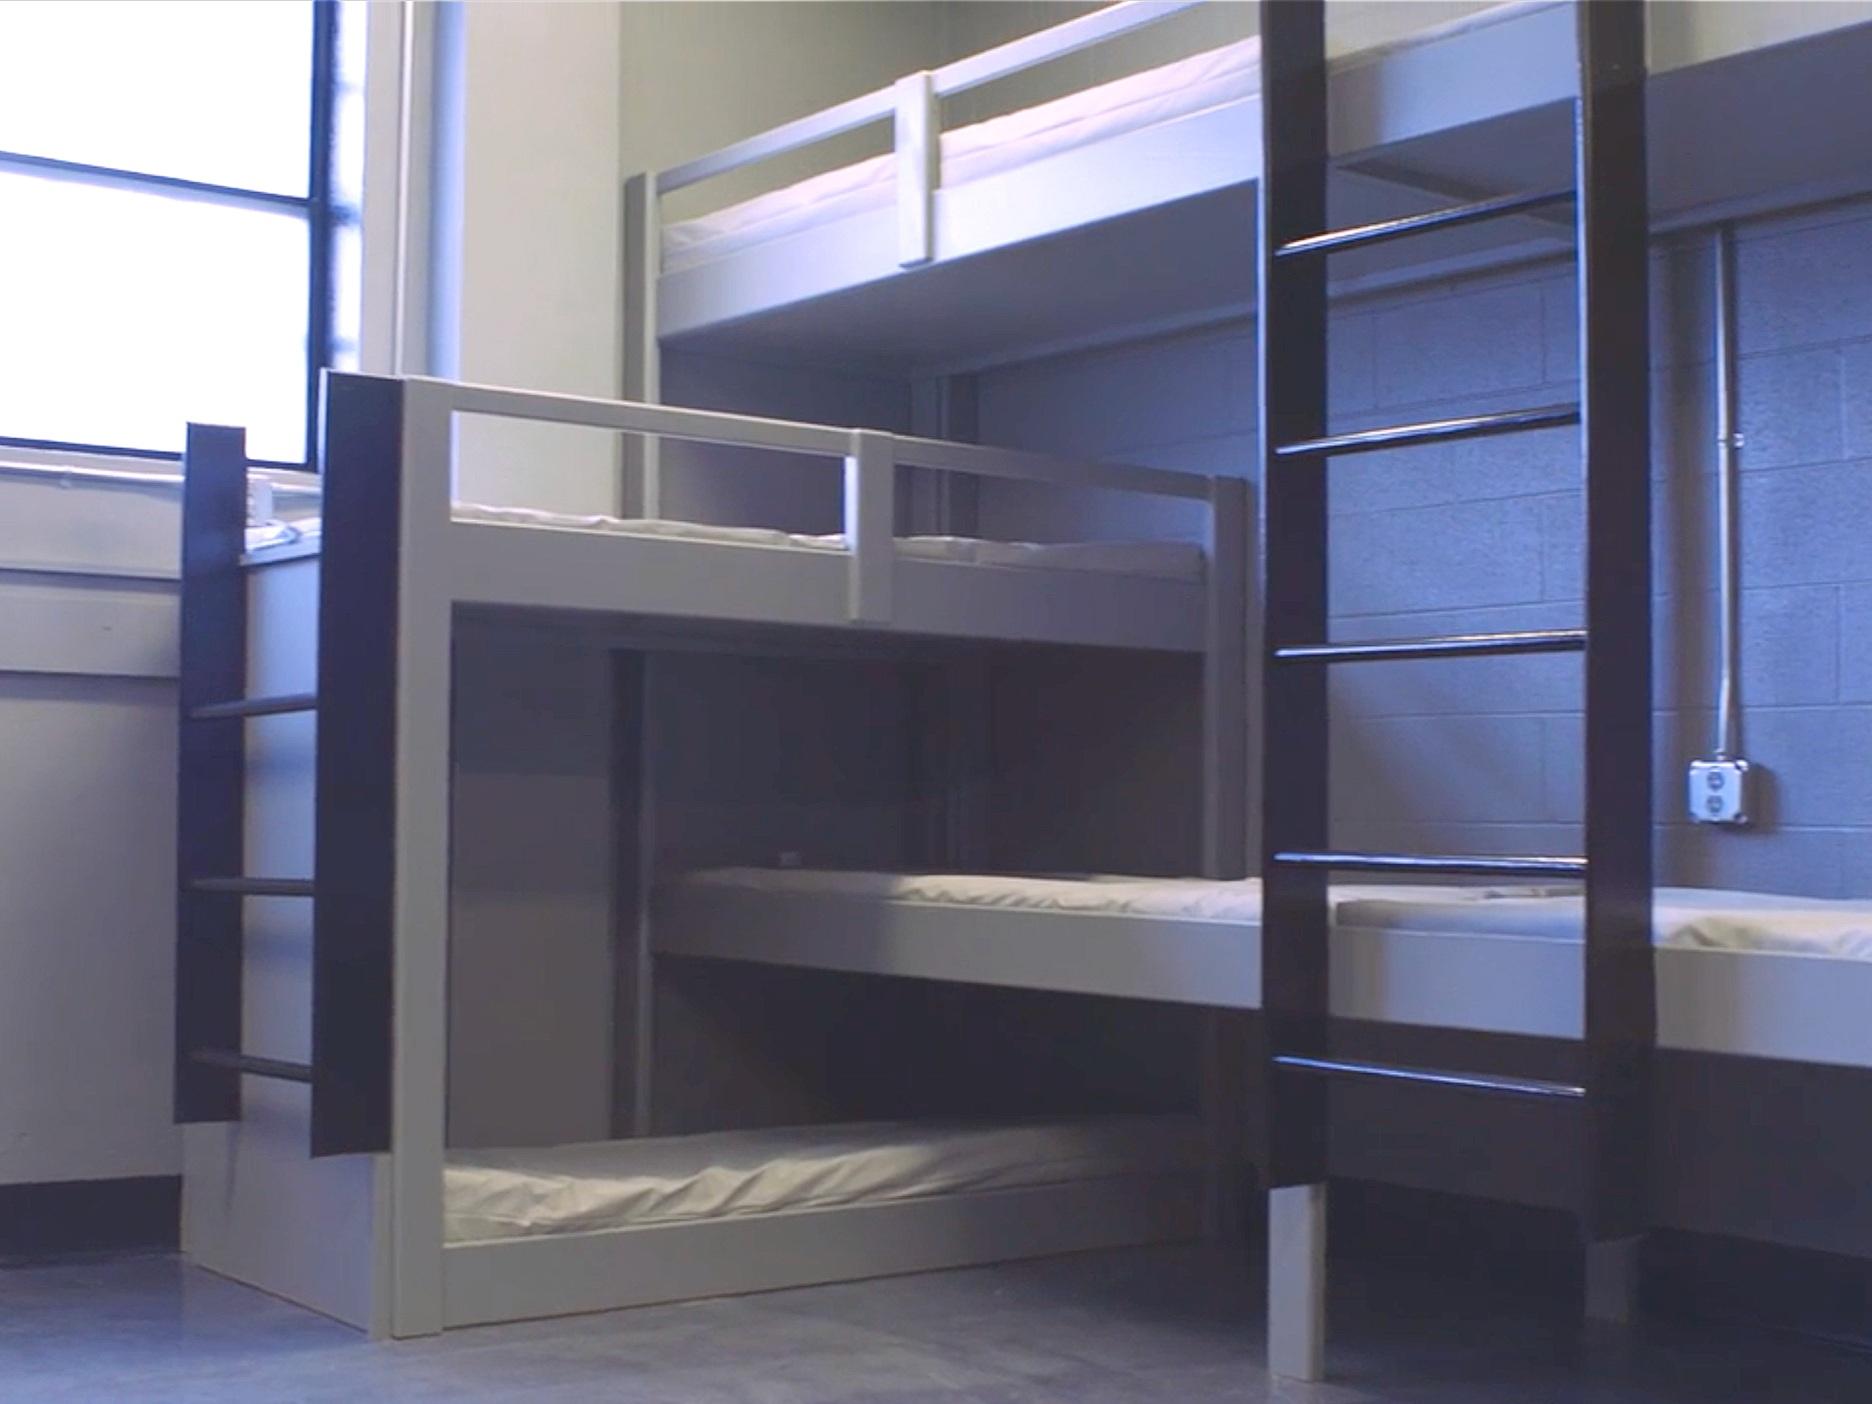 Serve901-bunkhouse-bunkbeds.jpg